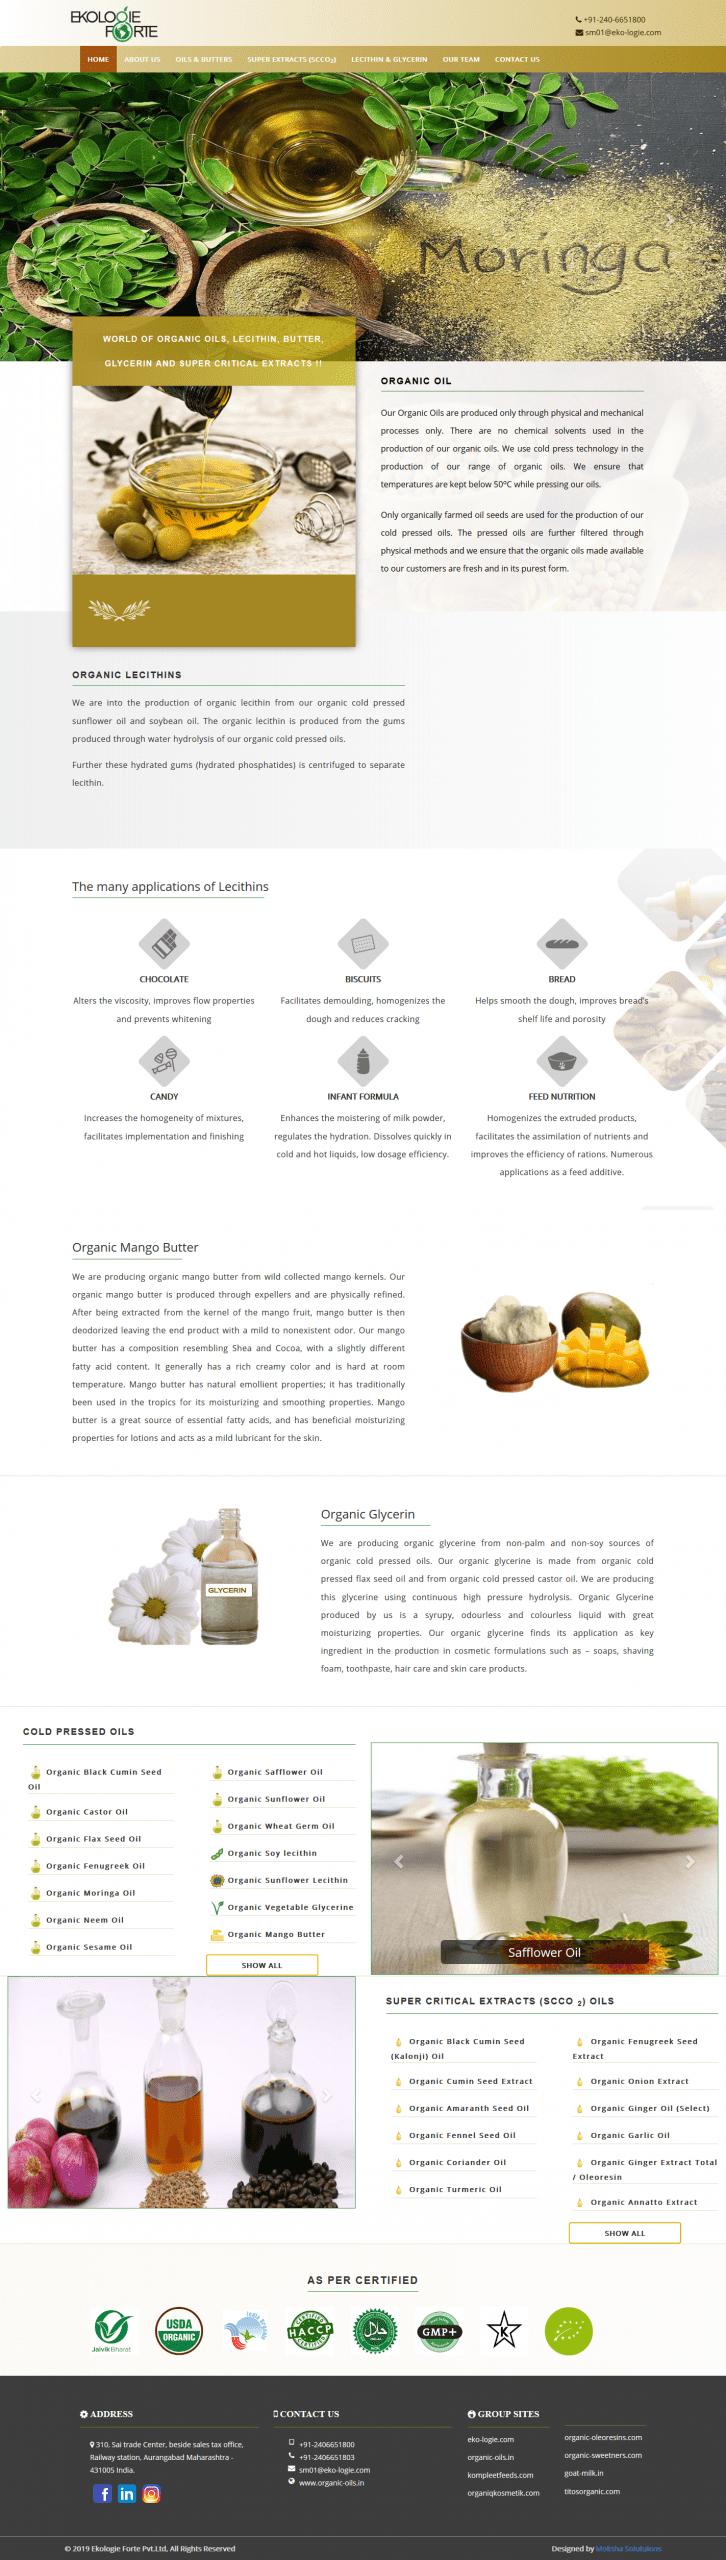 Website design and web development company Aurangabad